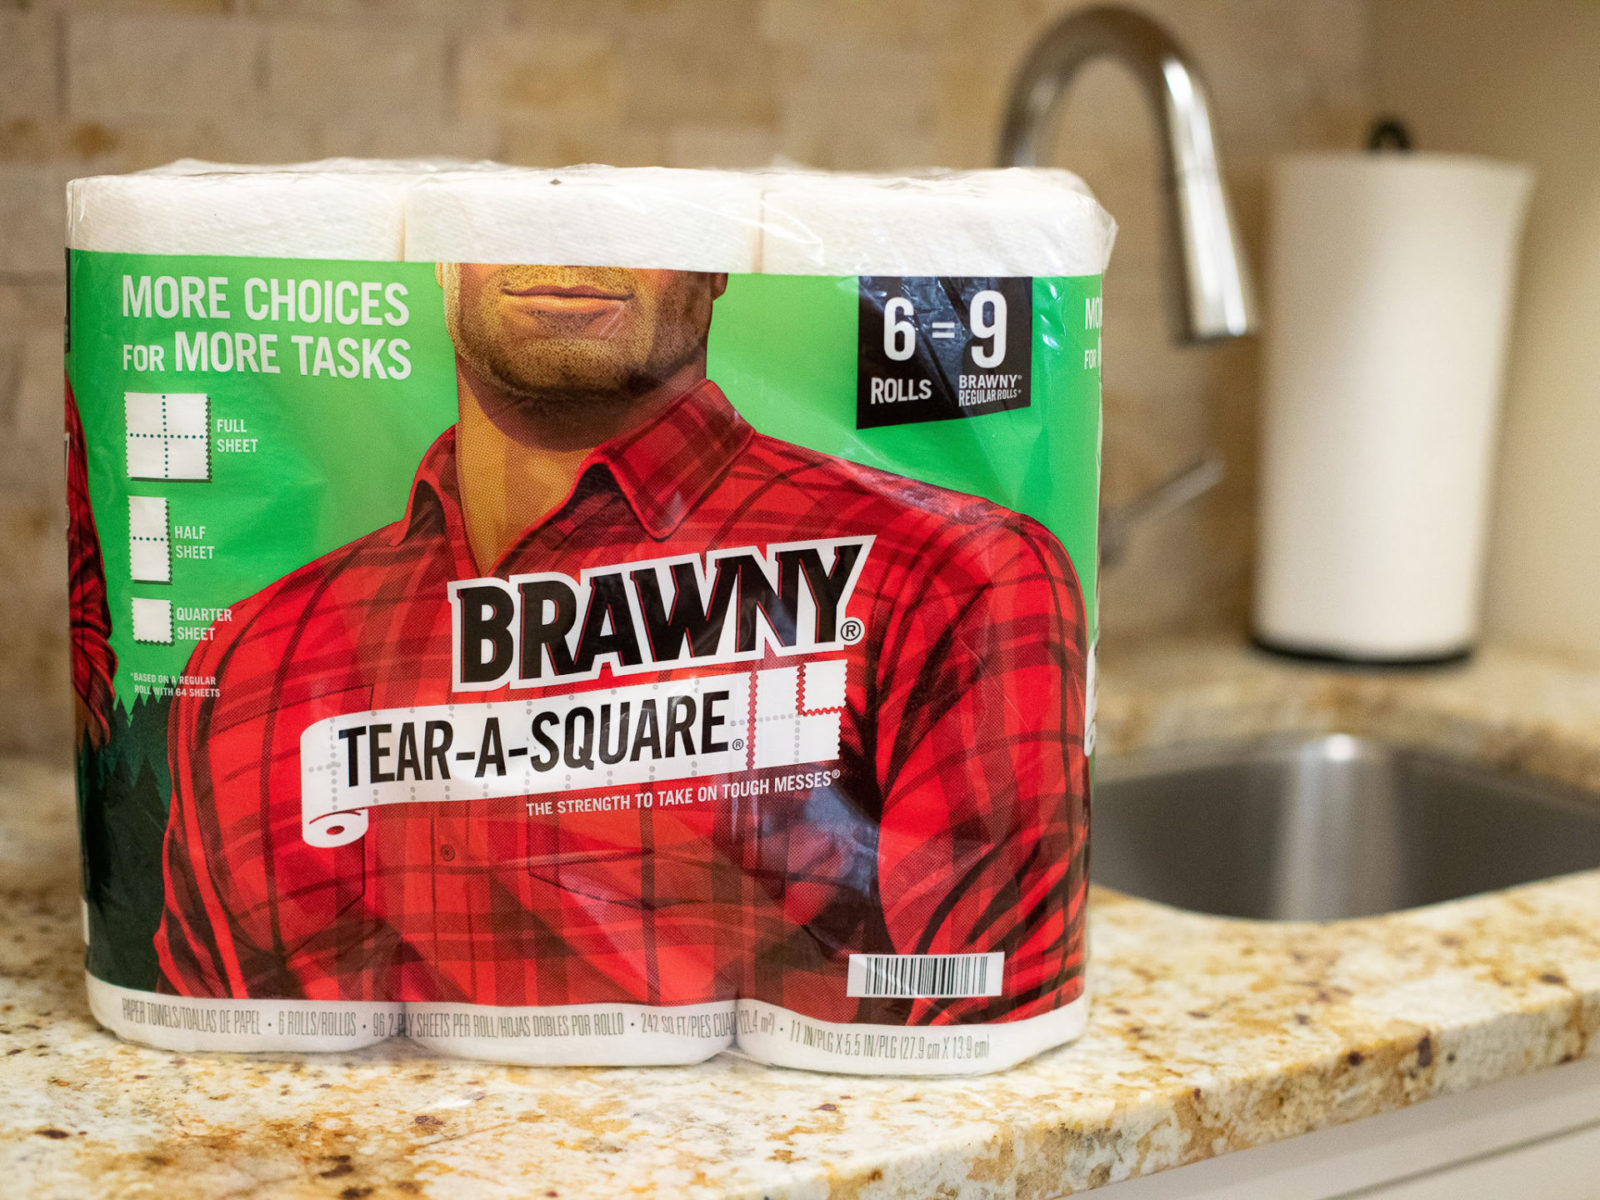 Brawny Tear-A-Square Paper Towels